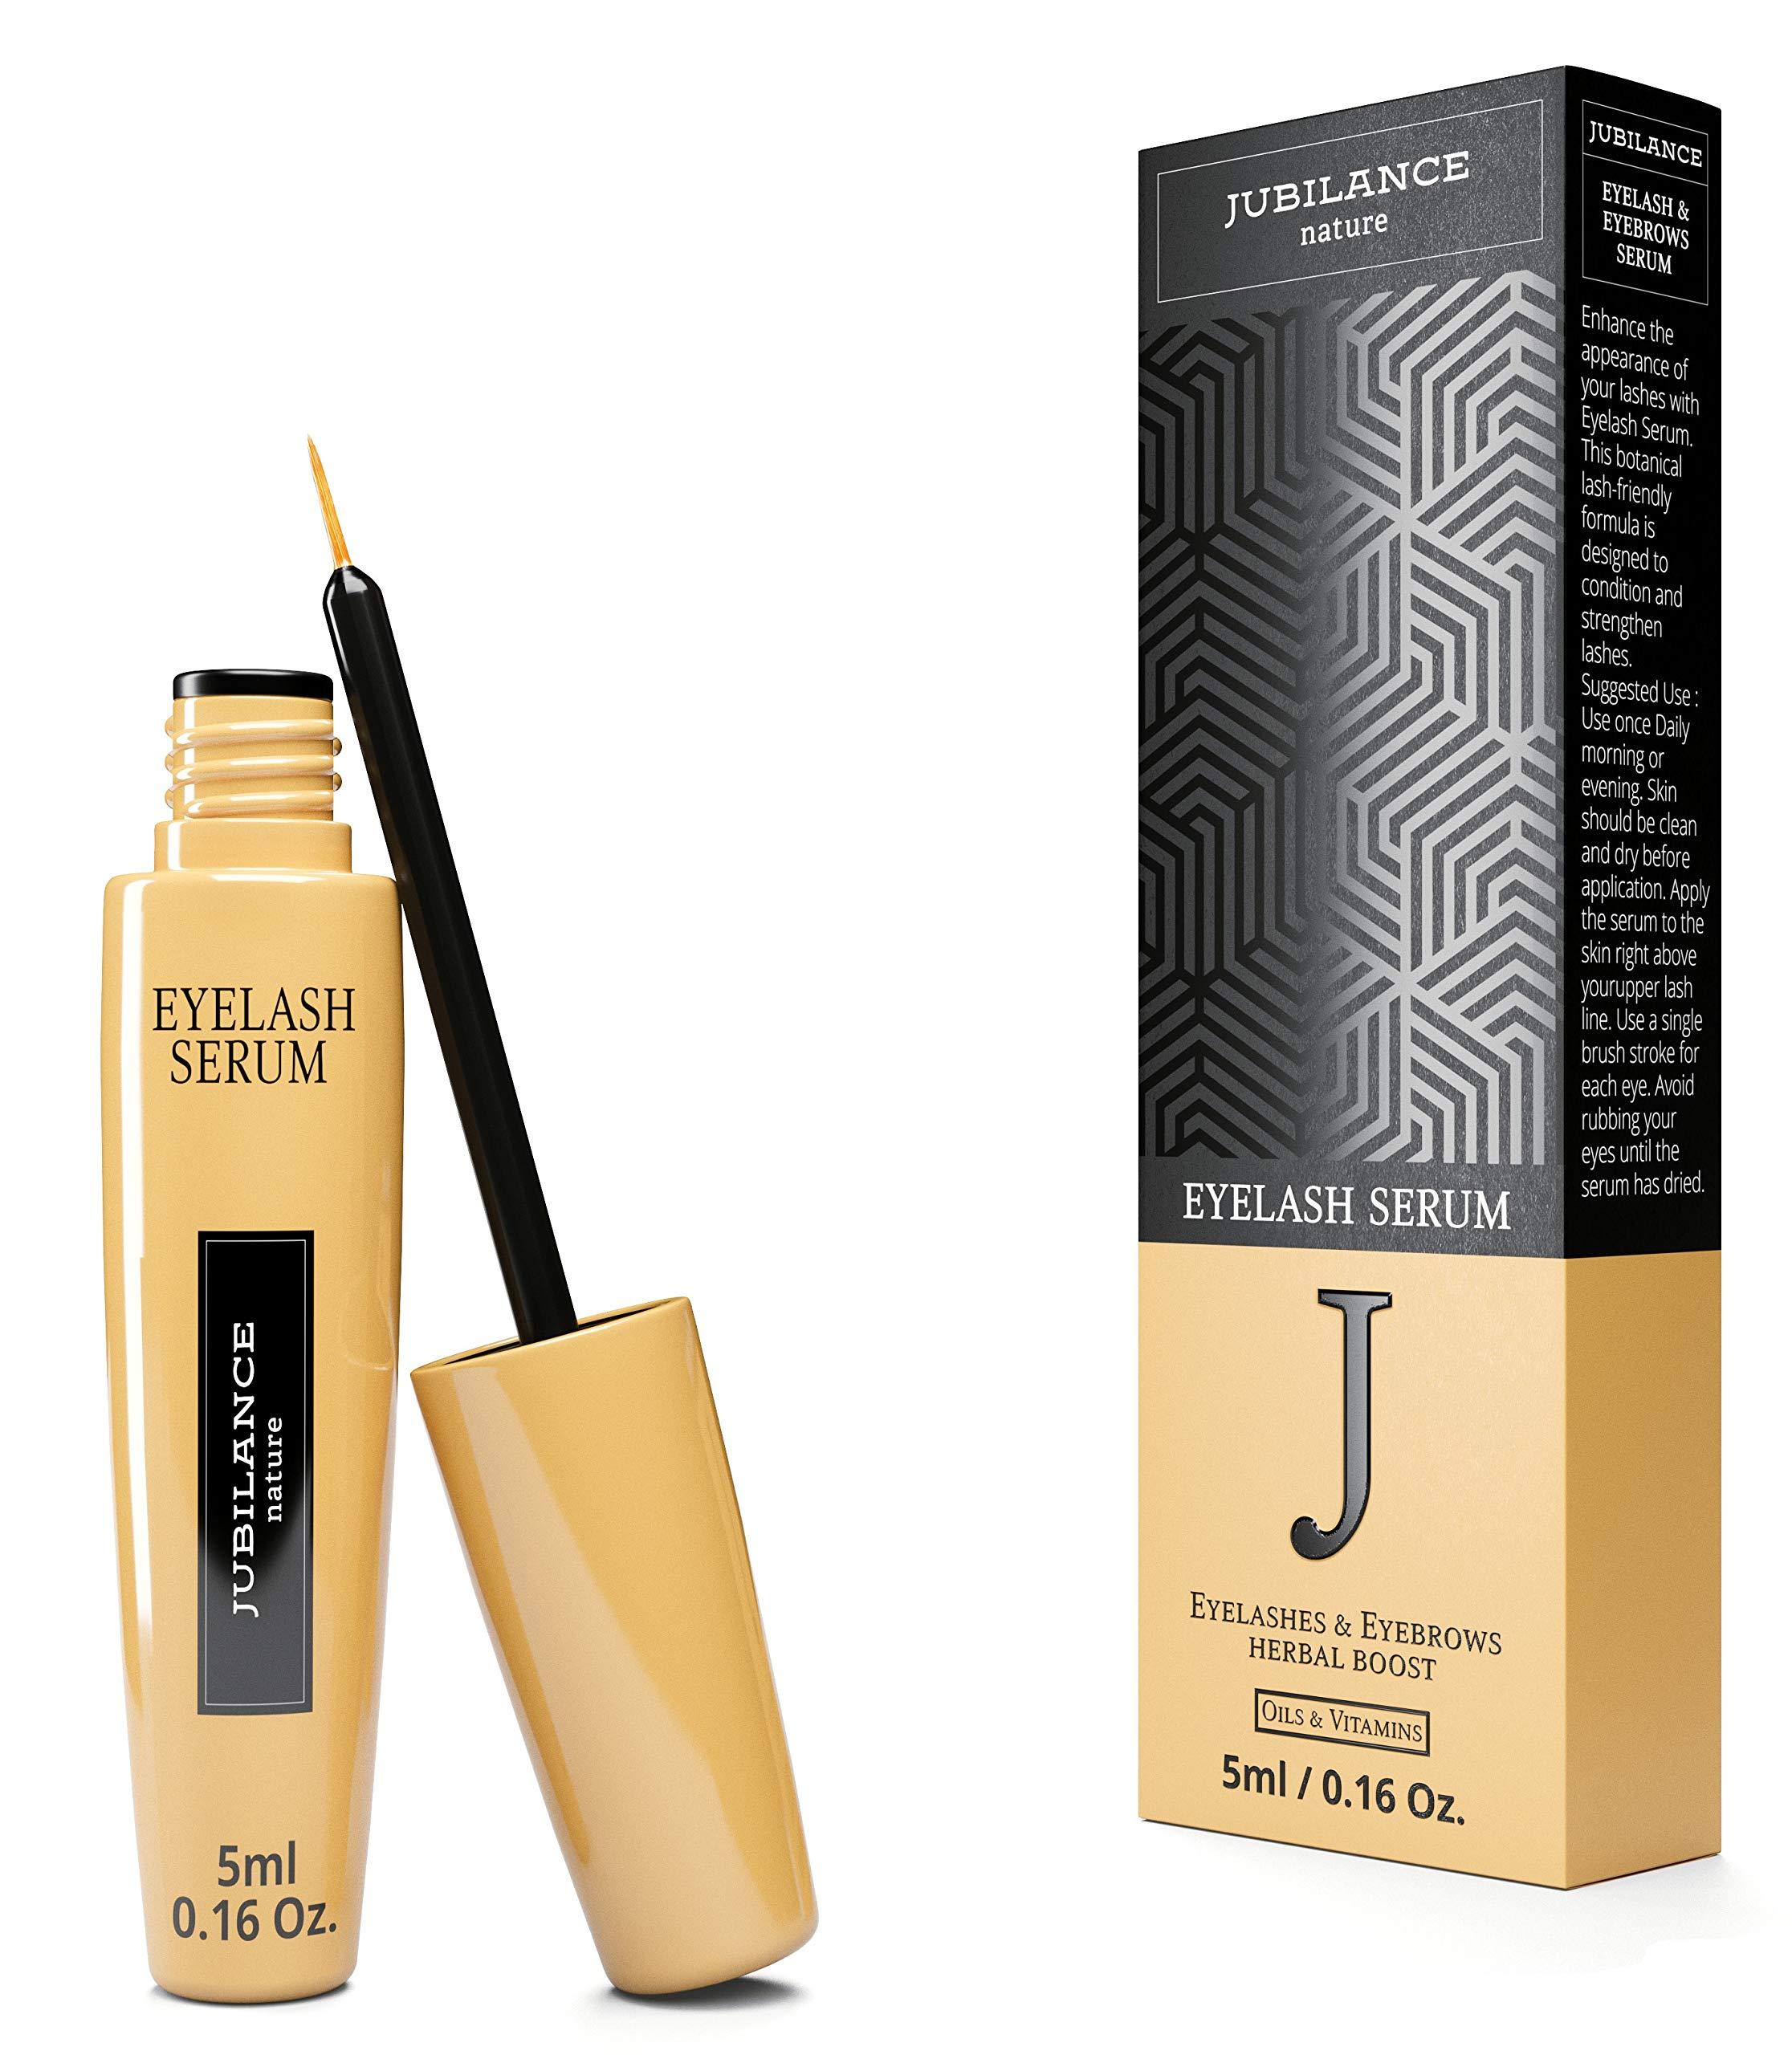 Eyelash & Eyebrows Extension Serum-5ml botanical formula by Jubilance Eyelashes & Eyebrows herbal boost a mix of oils and vitamins. Best natural lash regeneration. Dermatologic Lab tested.